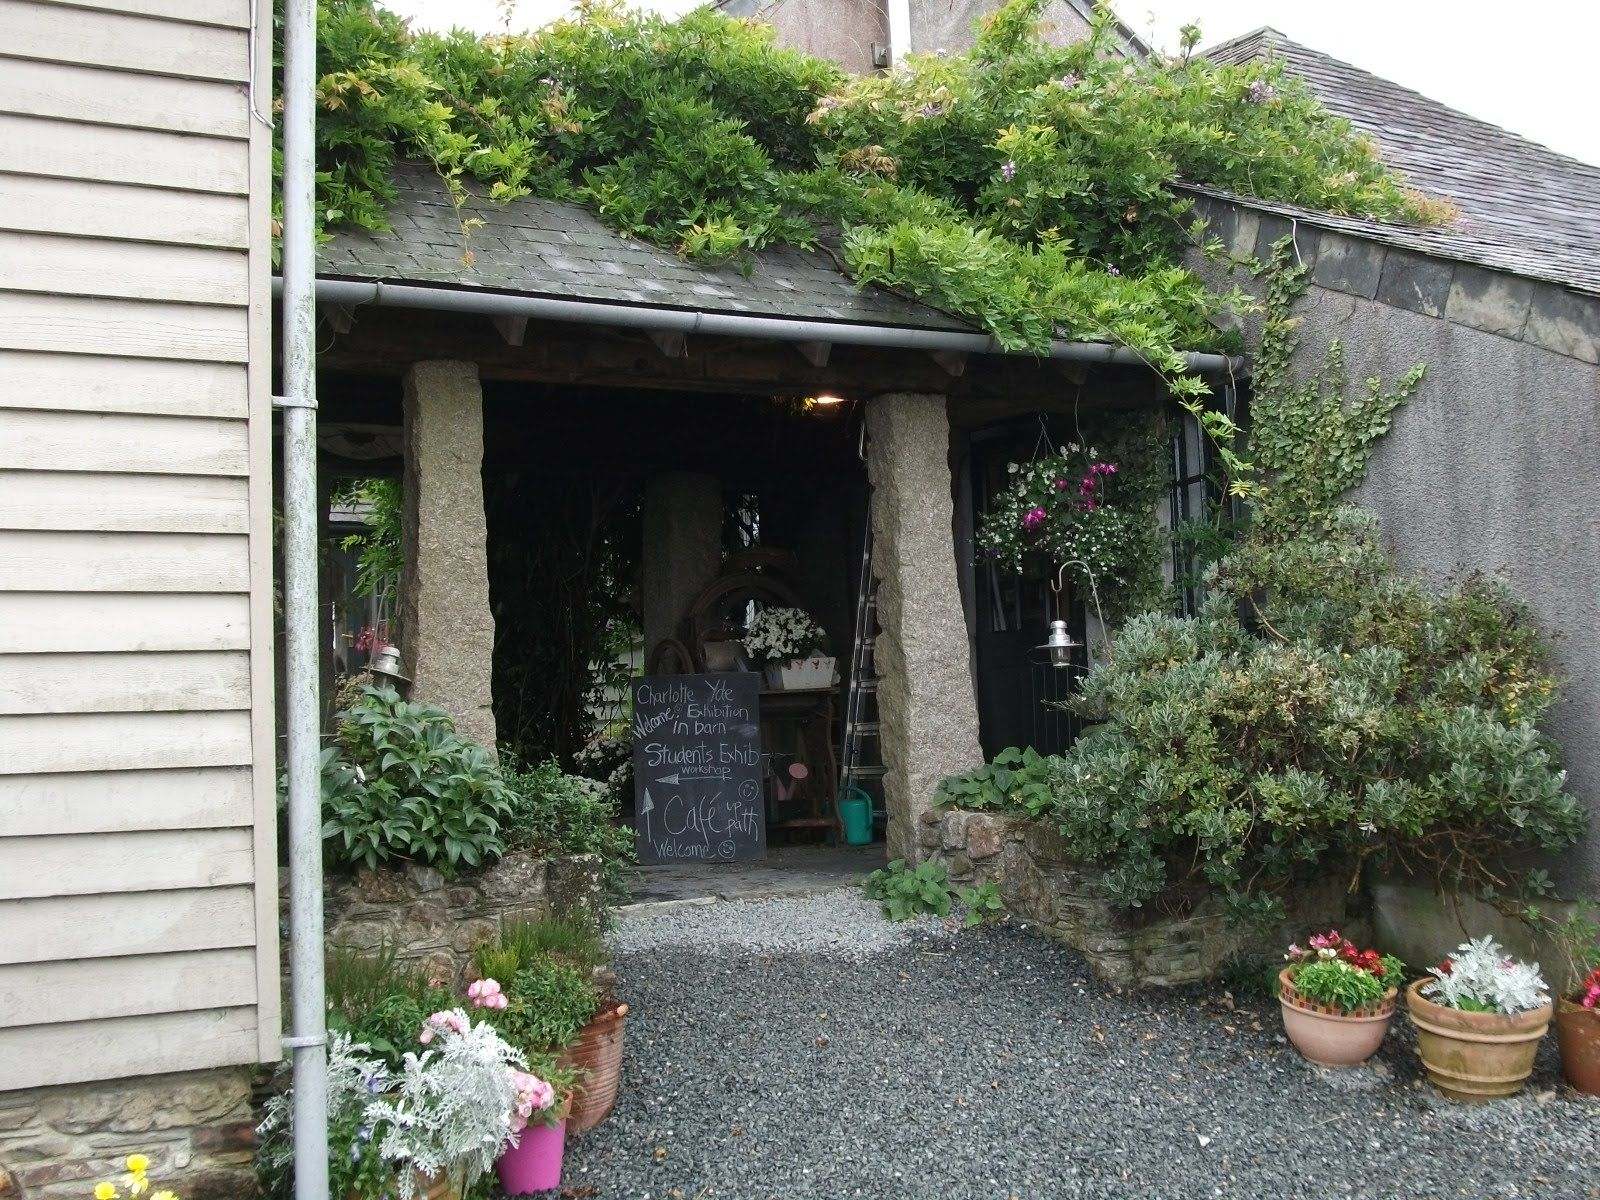 cowslip farm - site for quilt workshops | I Love ...